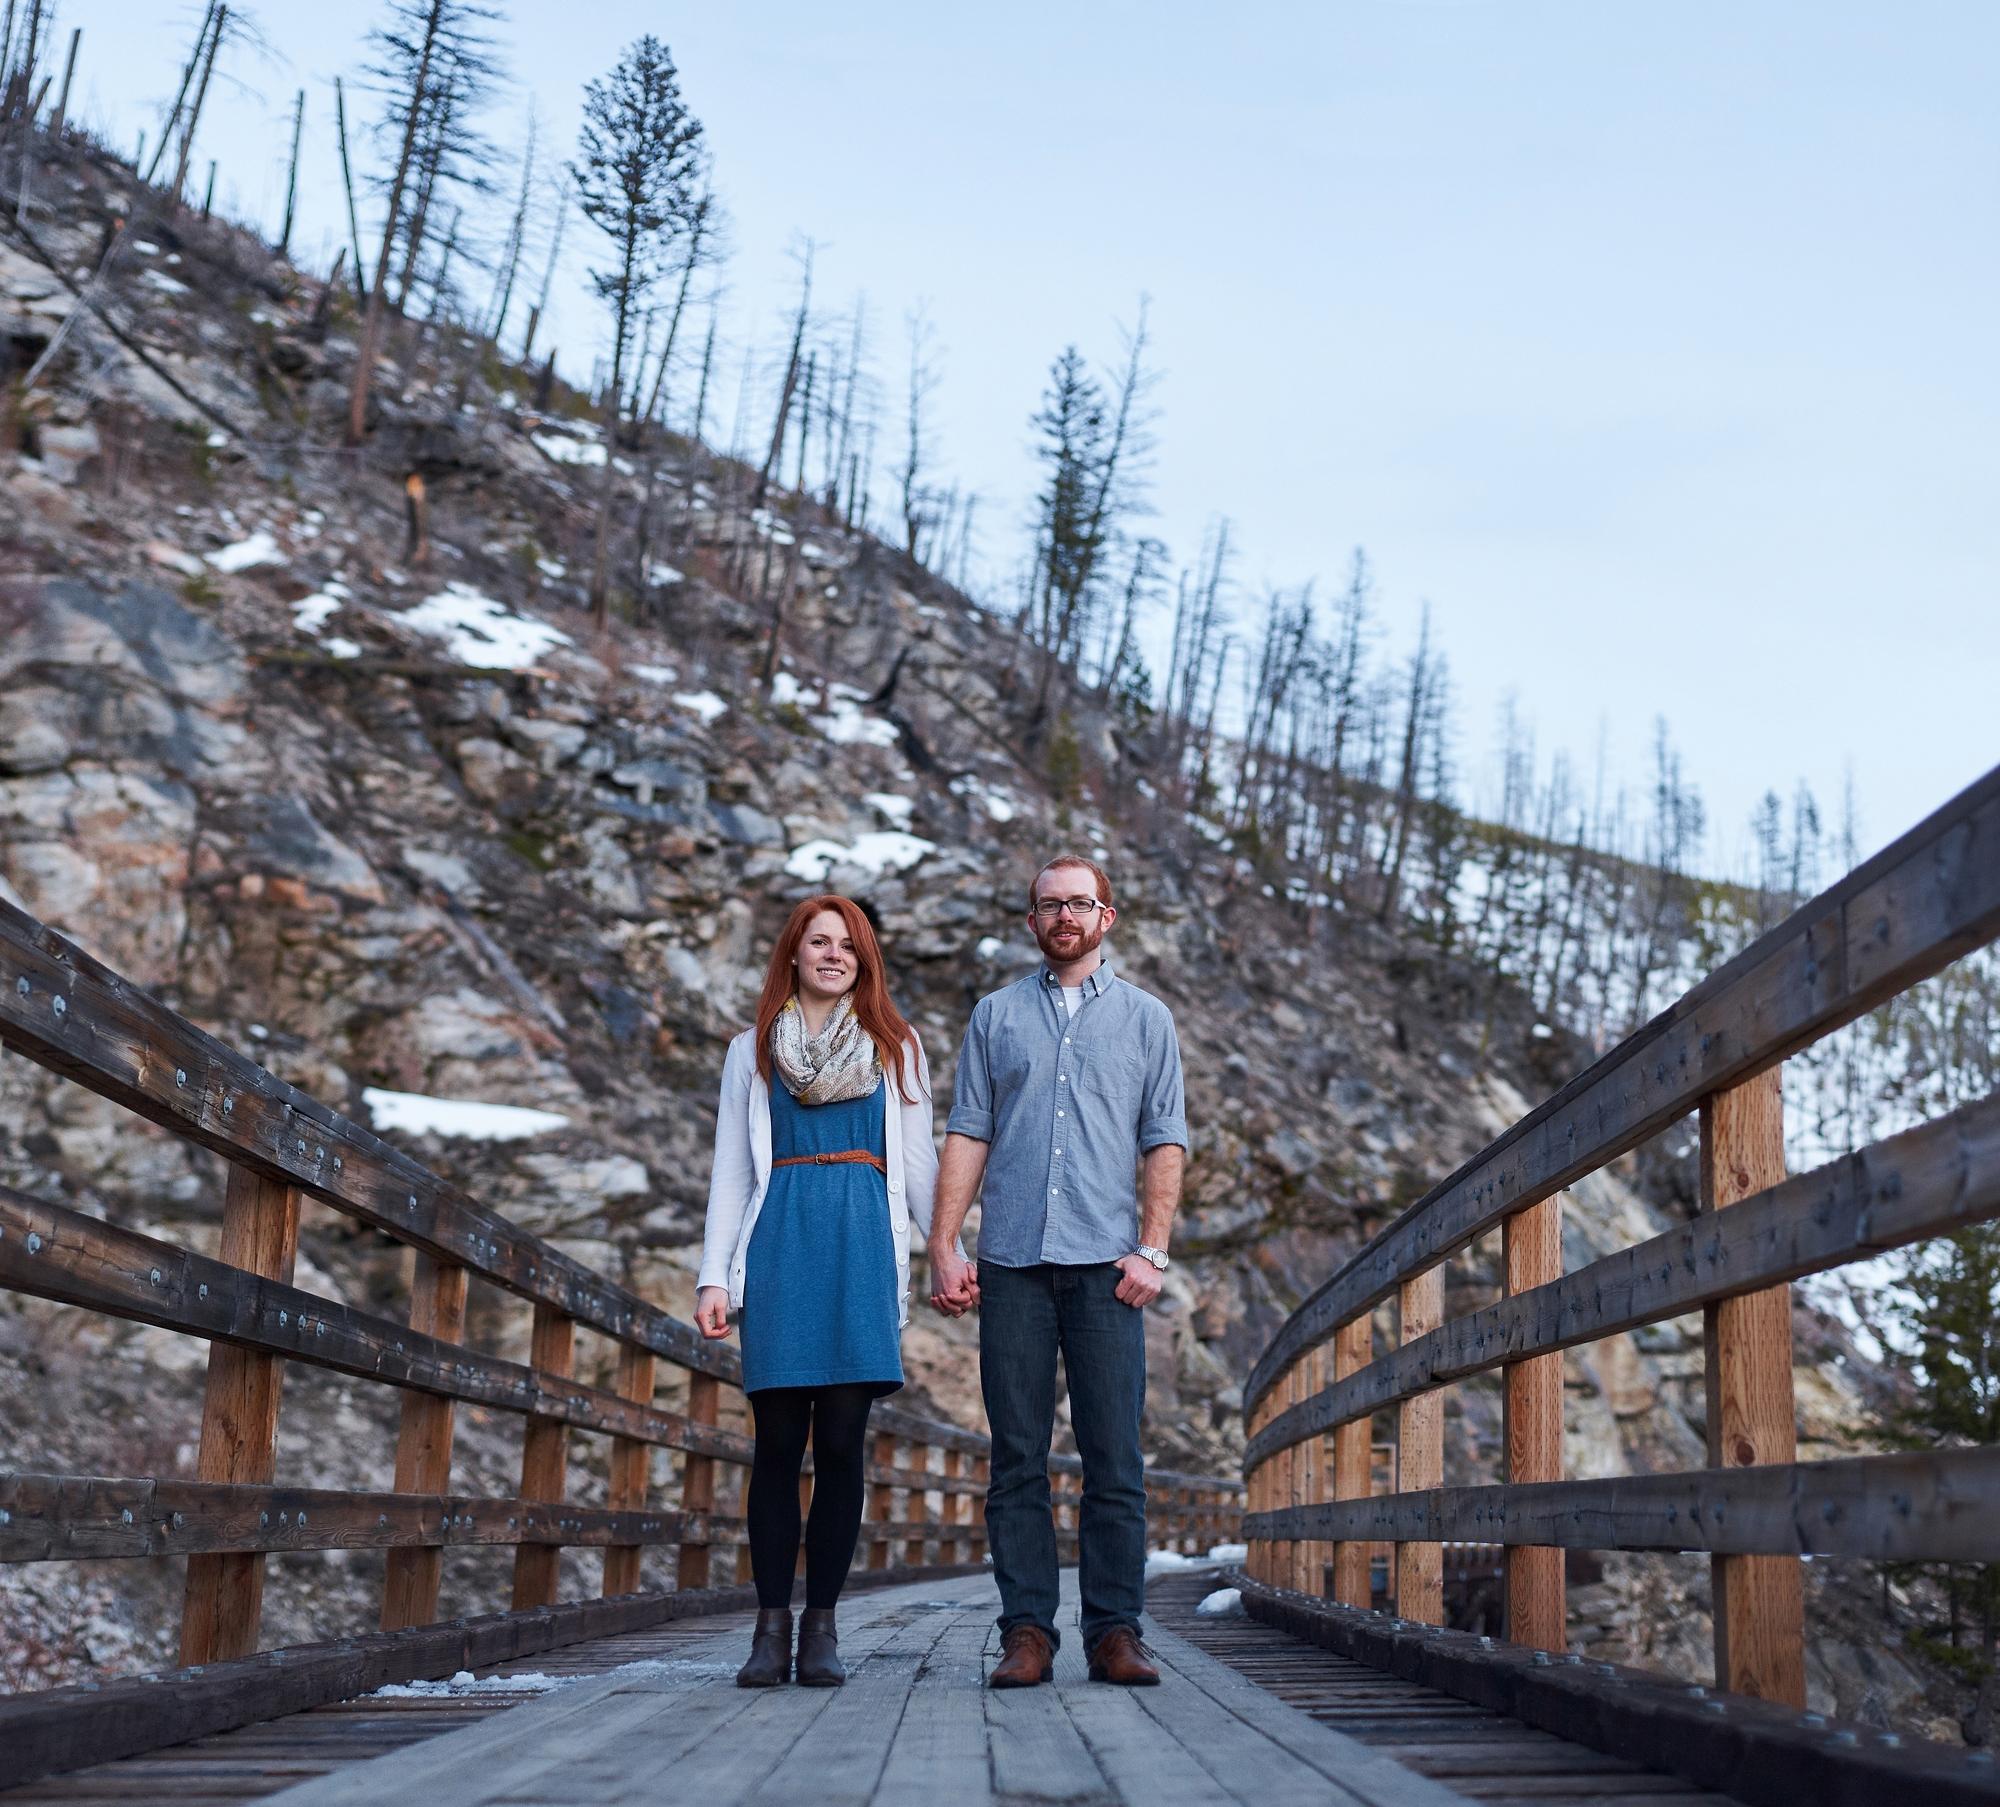 Jeff and Larissa Kelowna Engagement and Wedding